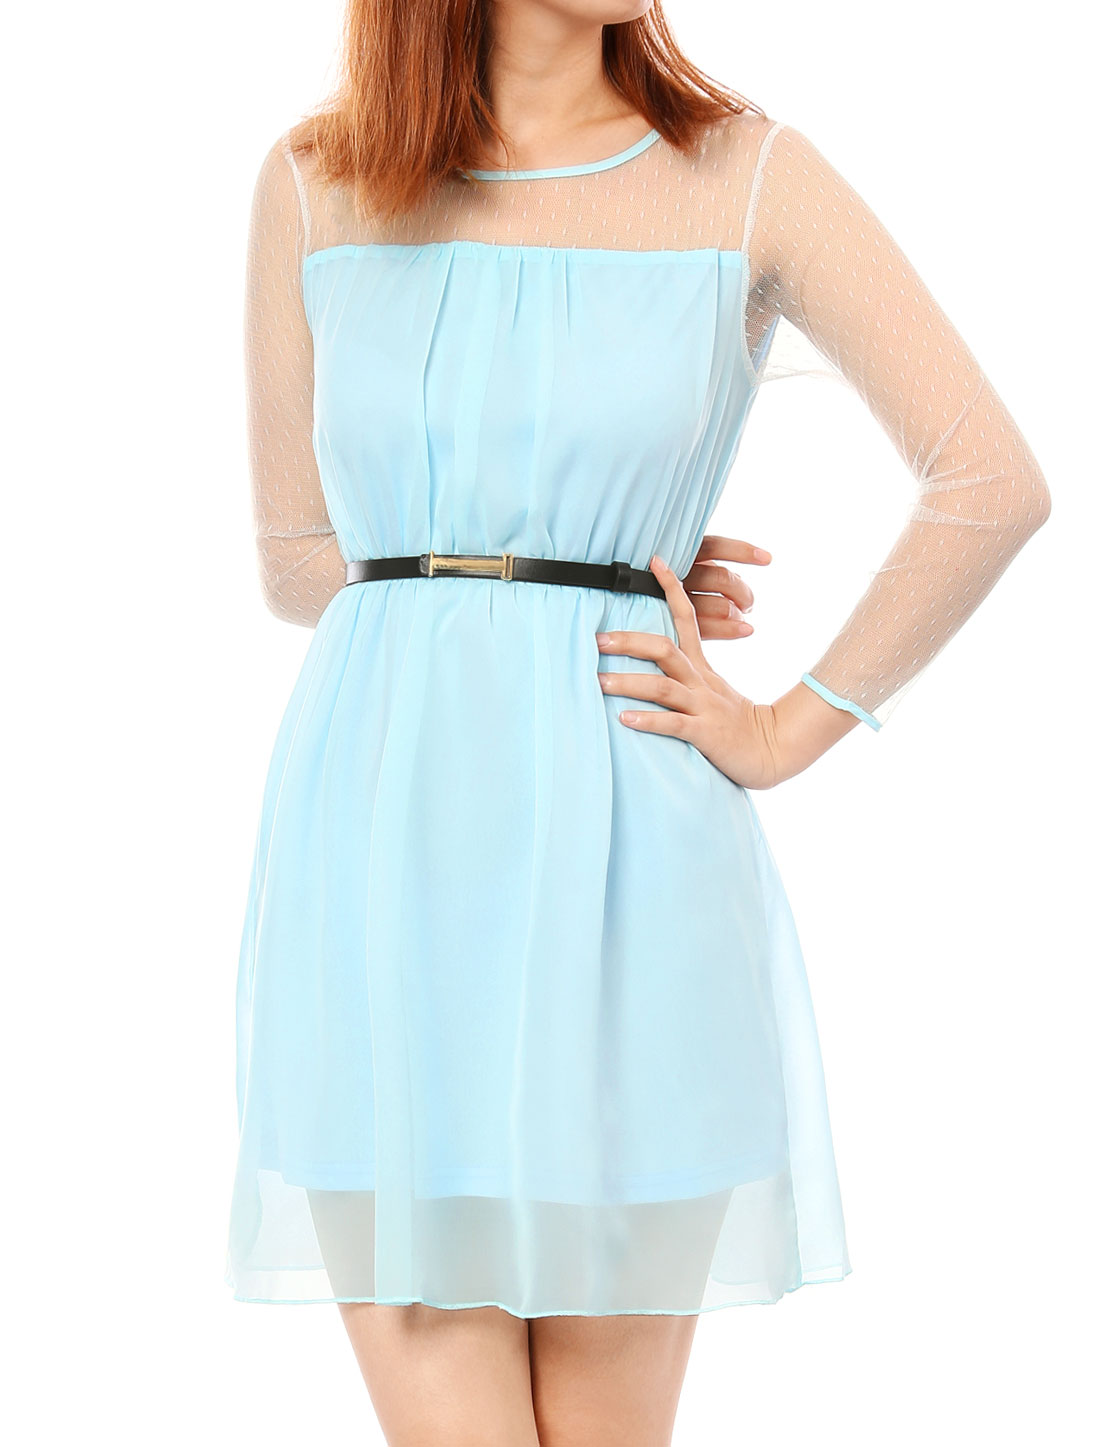 Pullover Light Blue Elastic Waist Design Lined Dress for Lady L